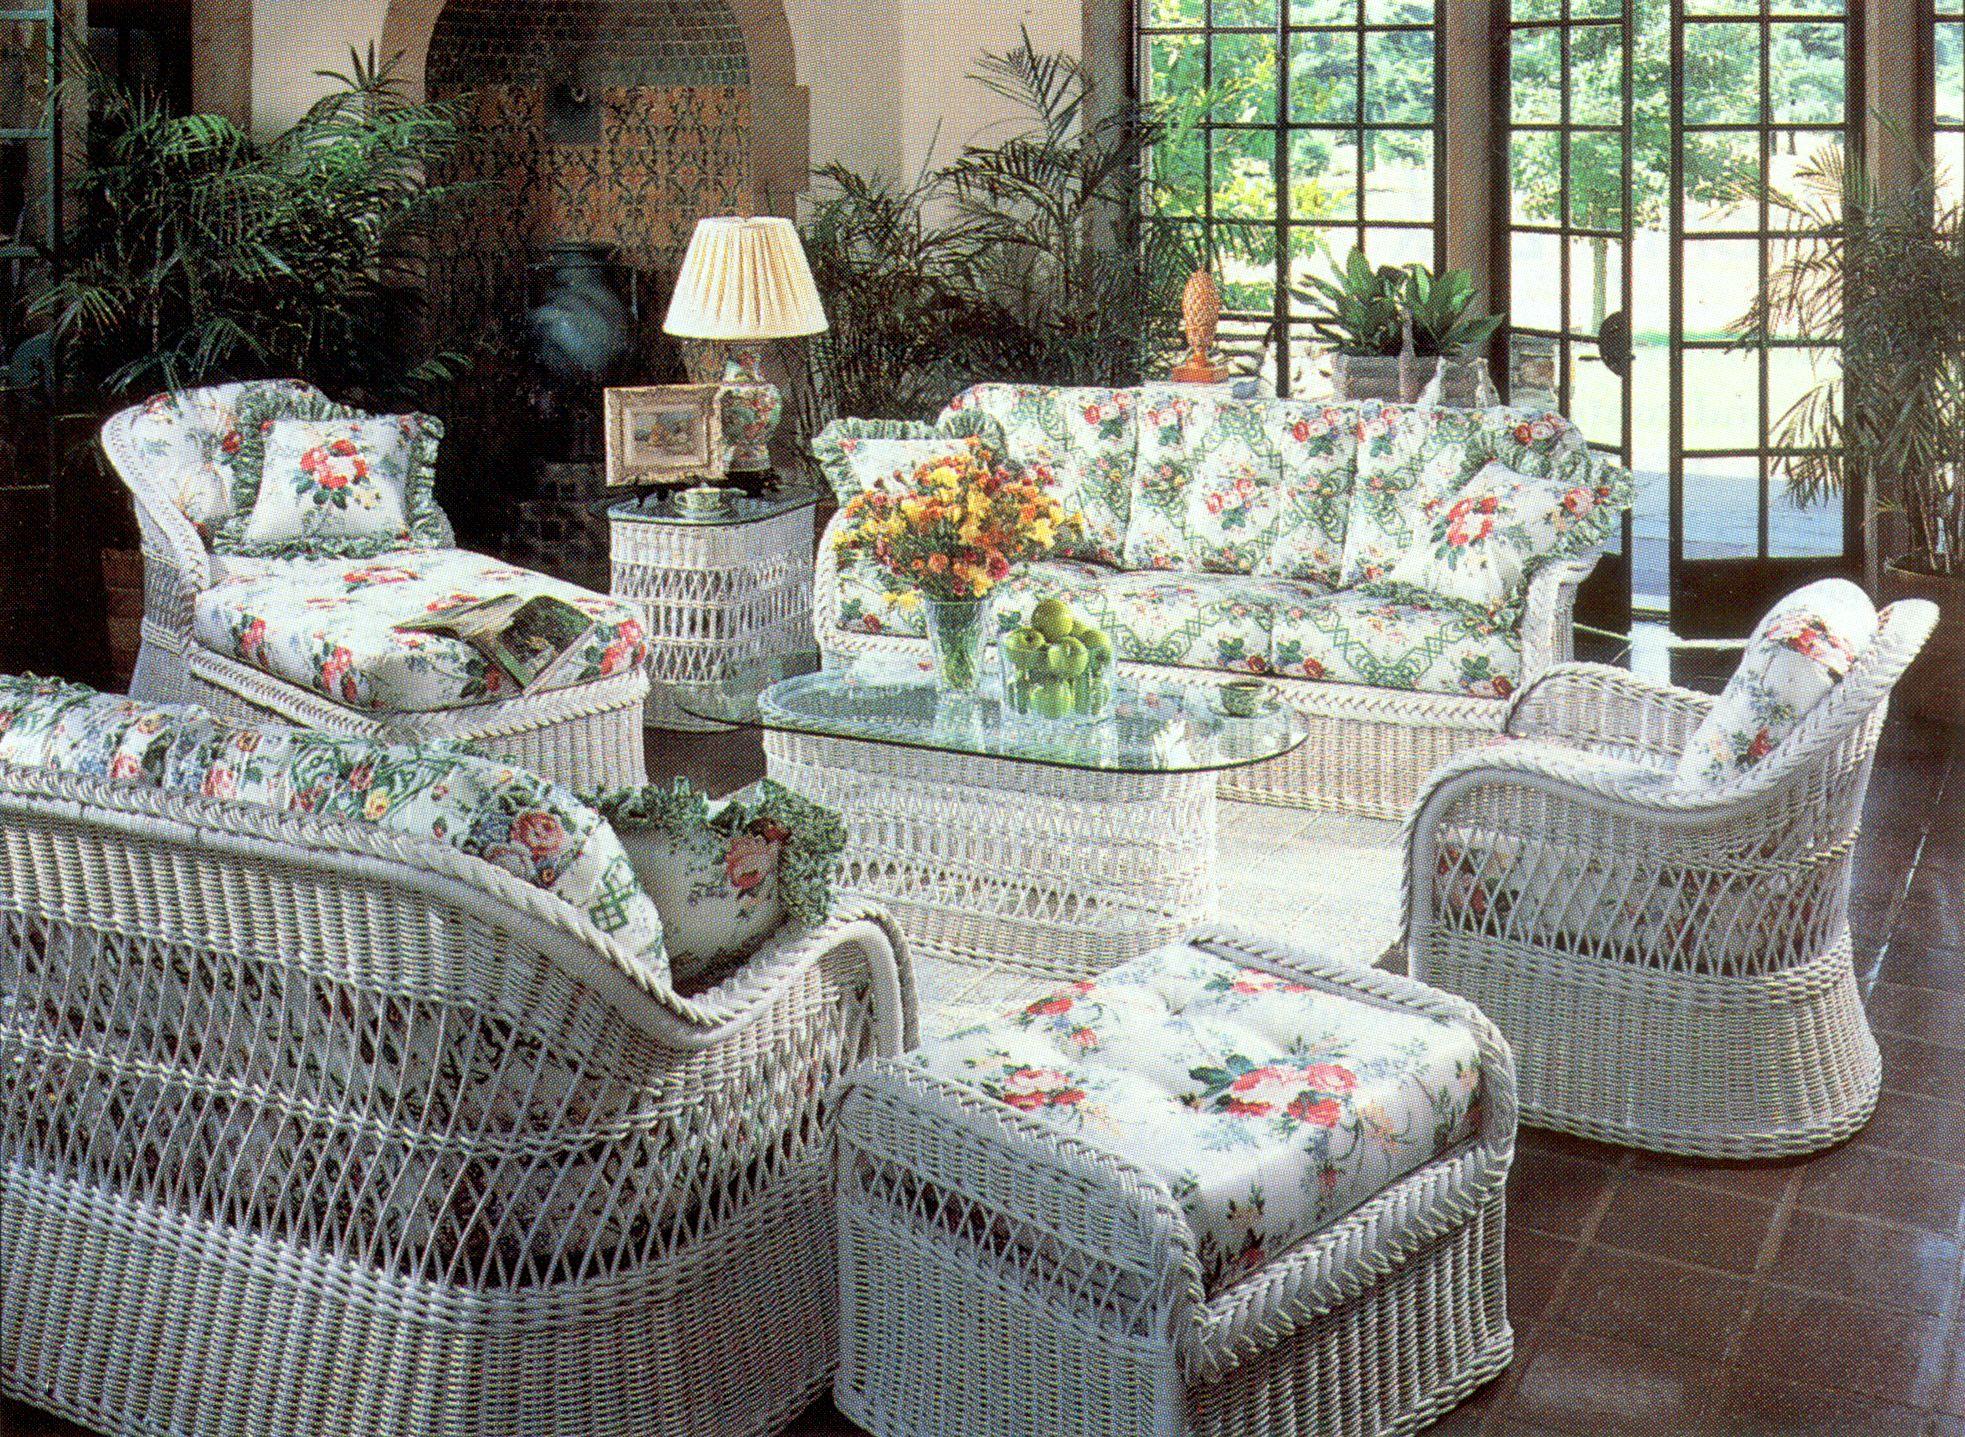 Henry Link White Wicker Furniture White Wicker Furniture Wicker